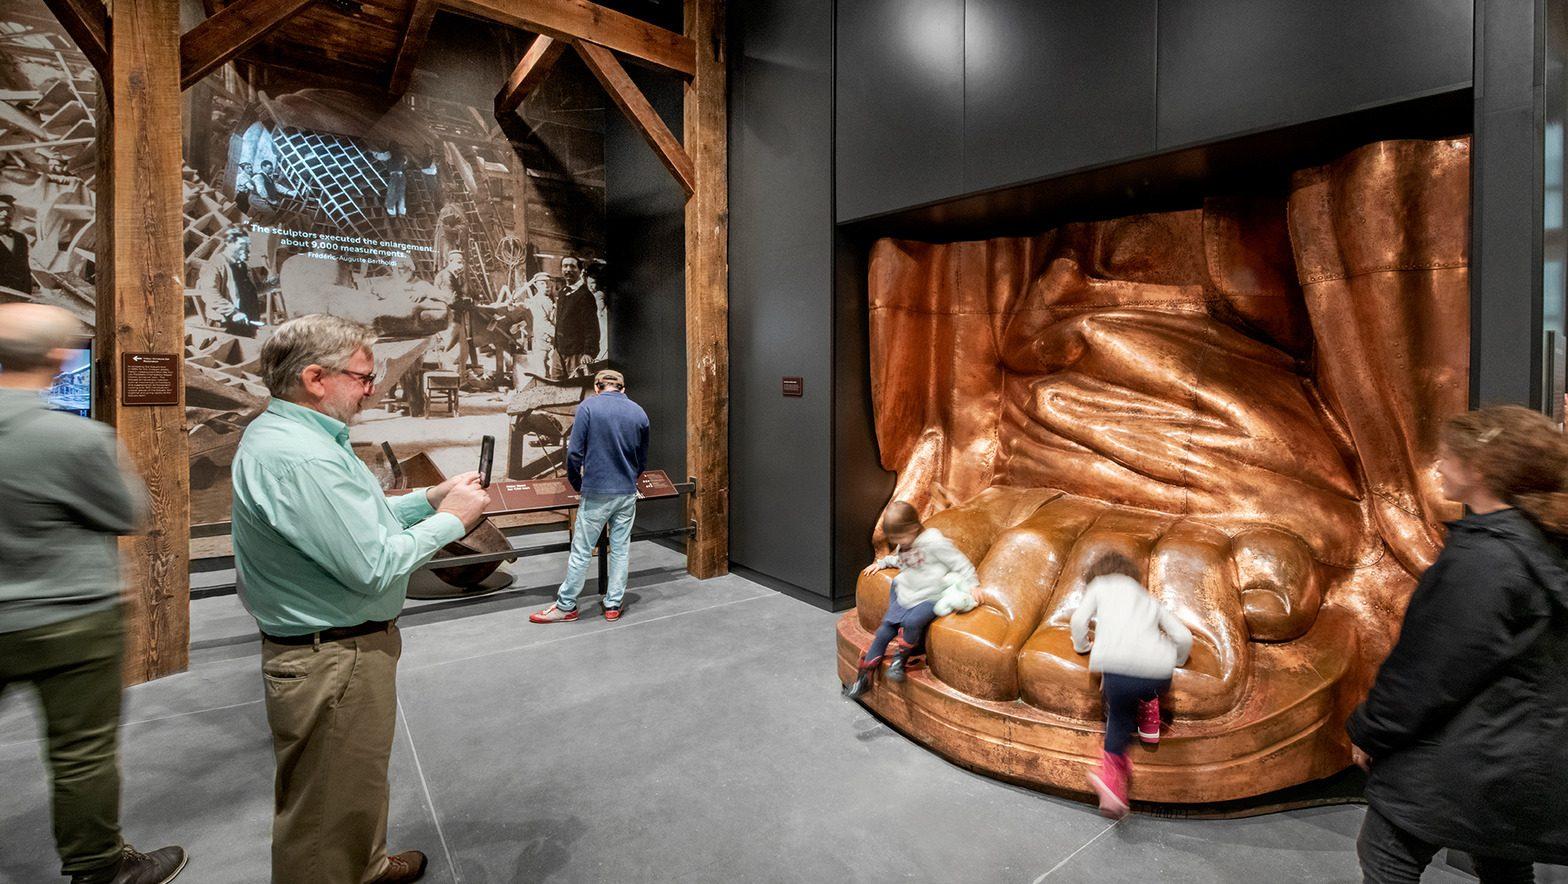 Statue of Liberty Museum interior.